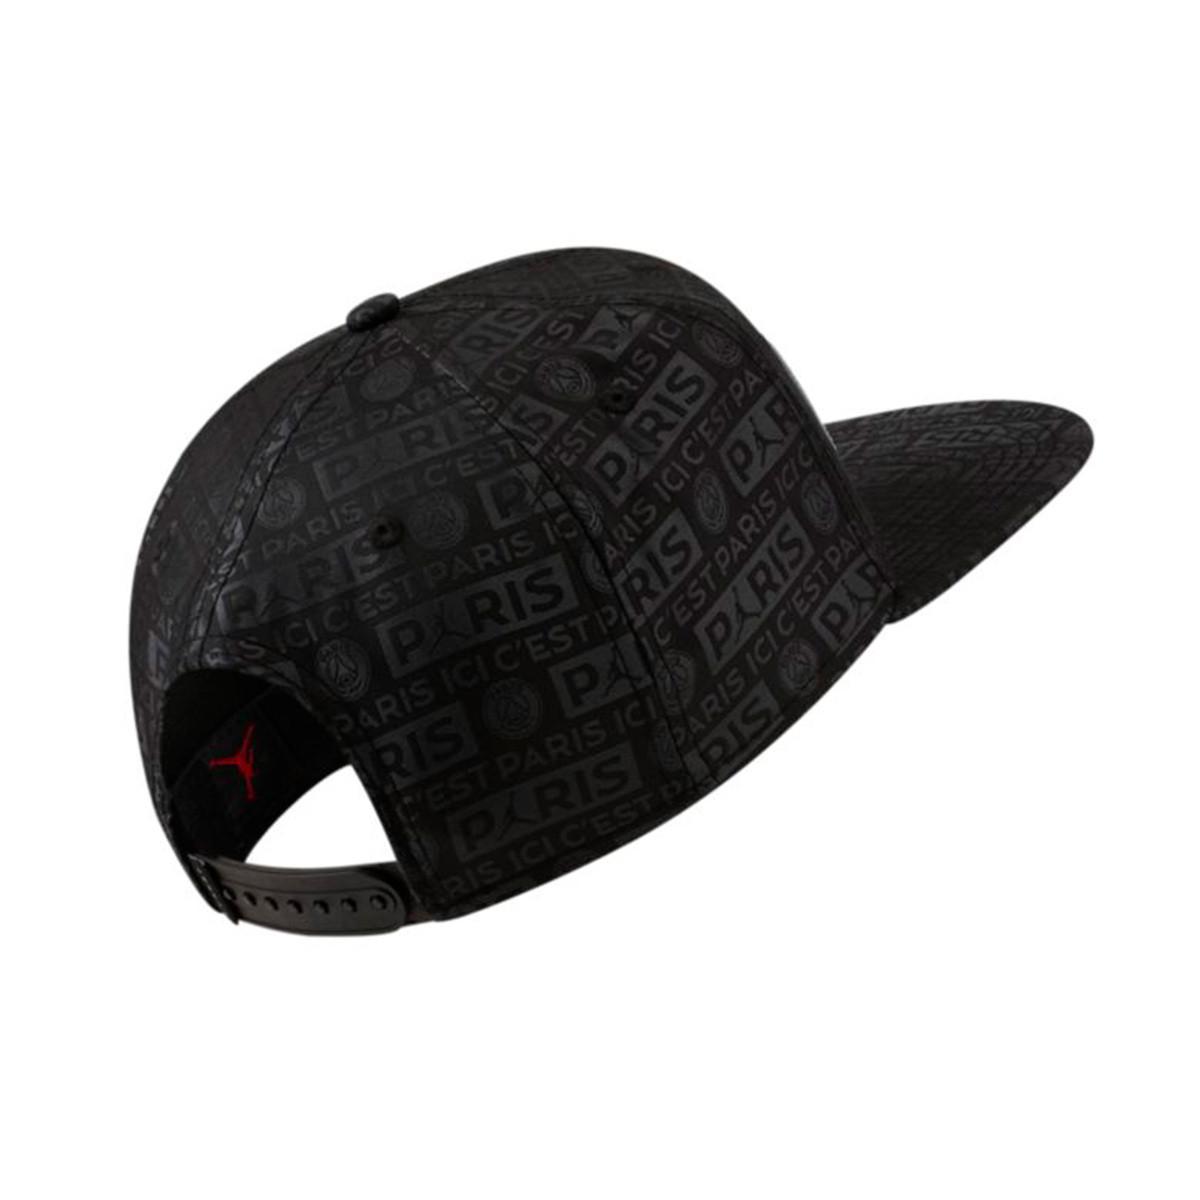 9e935ce0 Gorra Paris Saint-Germain Jordan Pro Snap Black